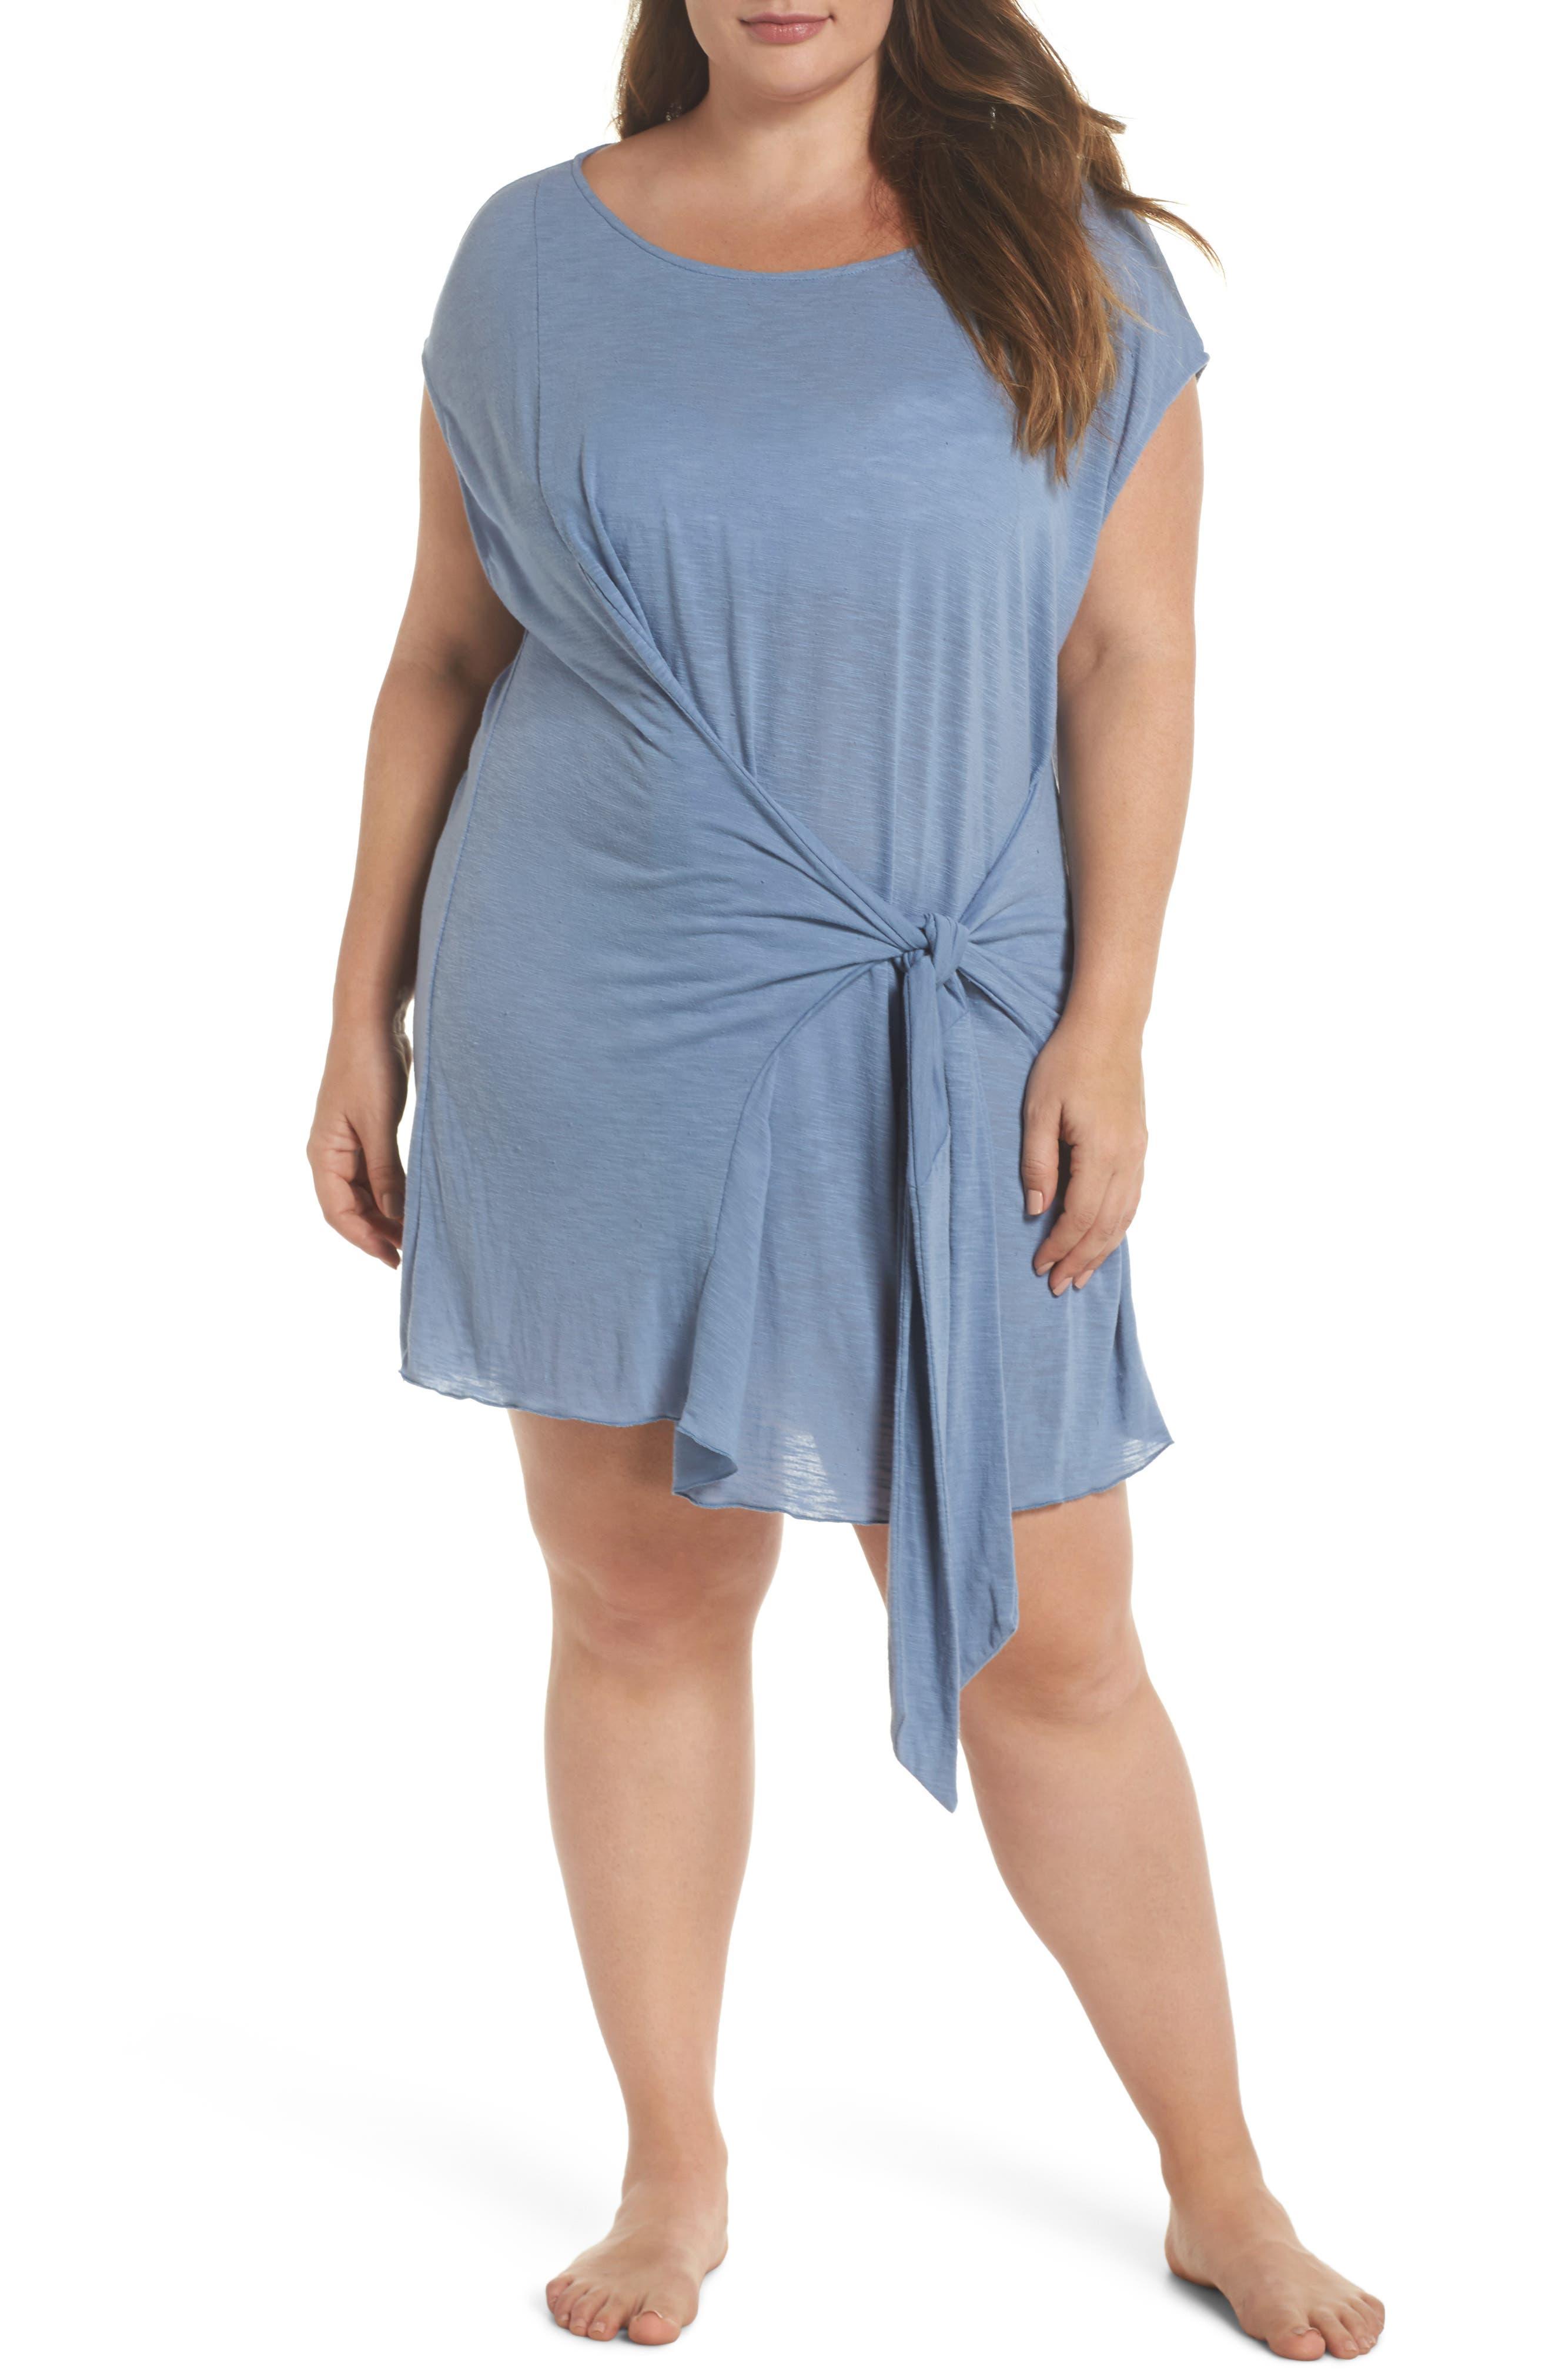 Becca Etc. Breezy Basic Cover-Up Dress (Plus Size)